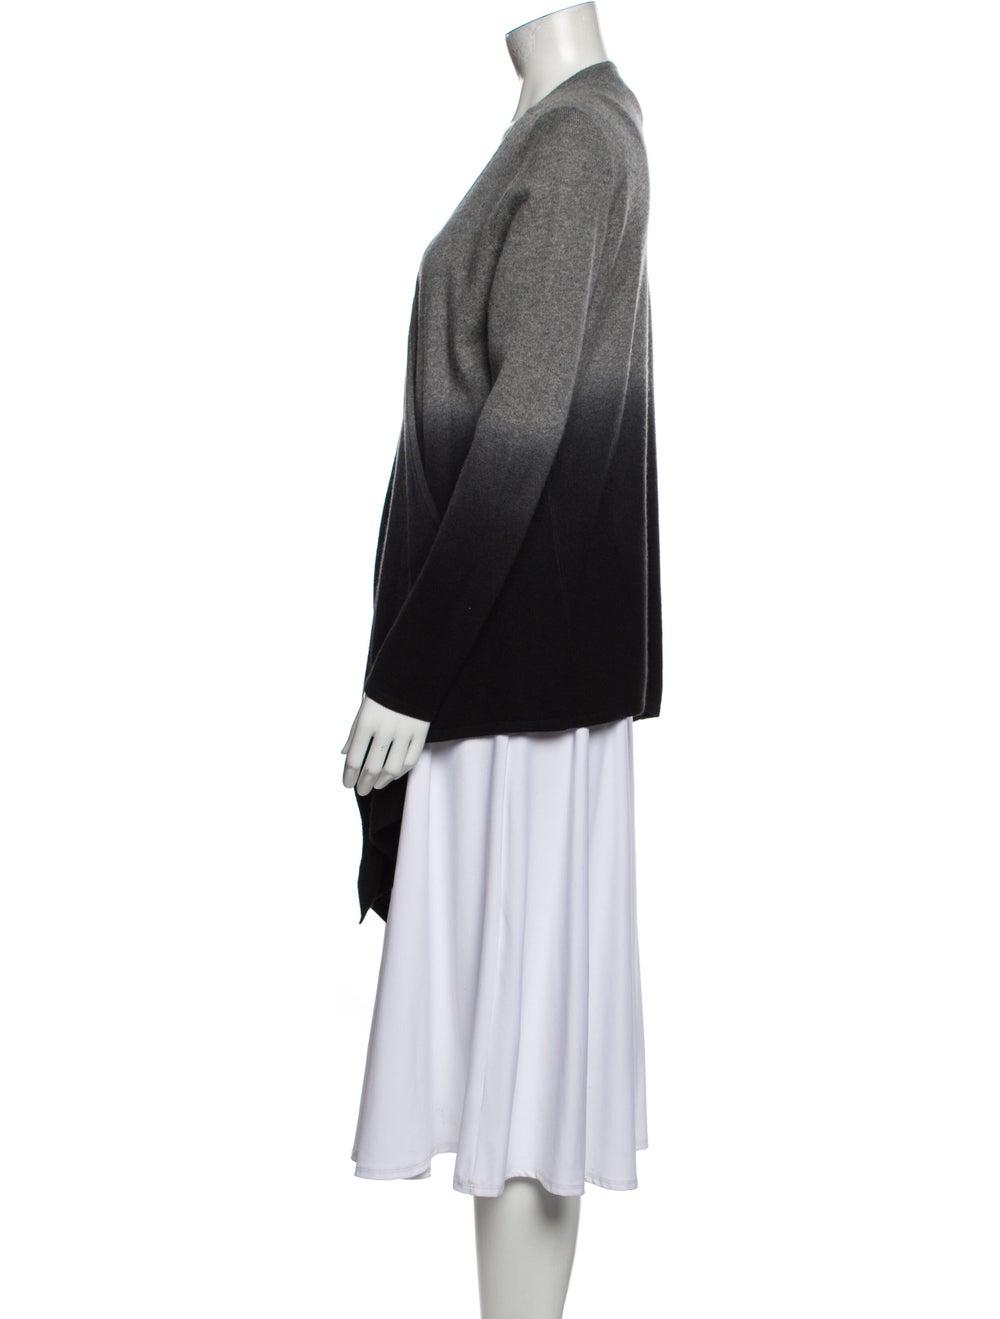 Neiman Marcus Cashmere Tie-Dye Print Sweater Grey - image 2